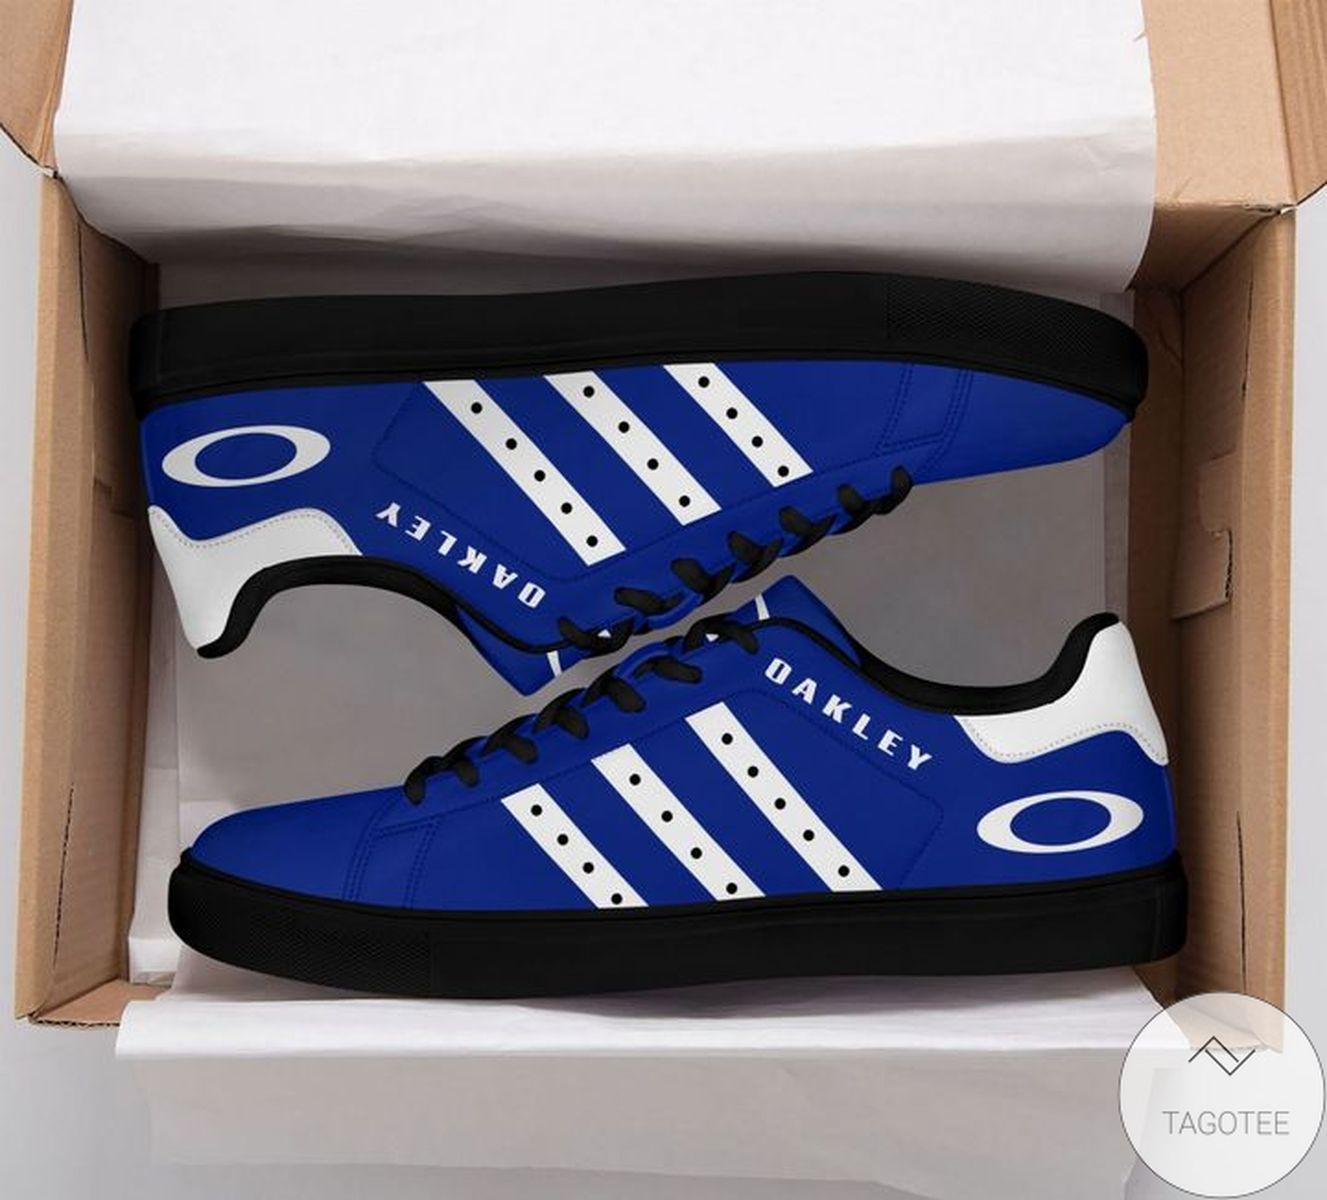 Oakley Blue Stan Smith Shoes